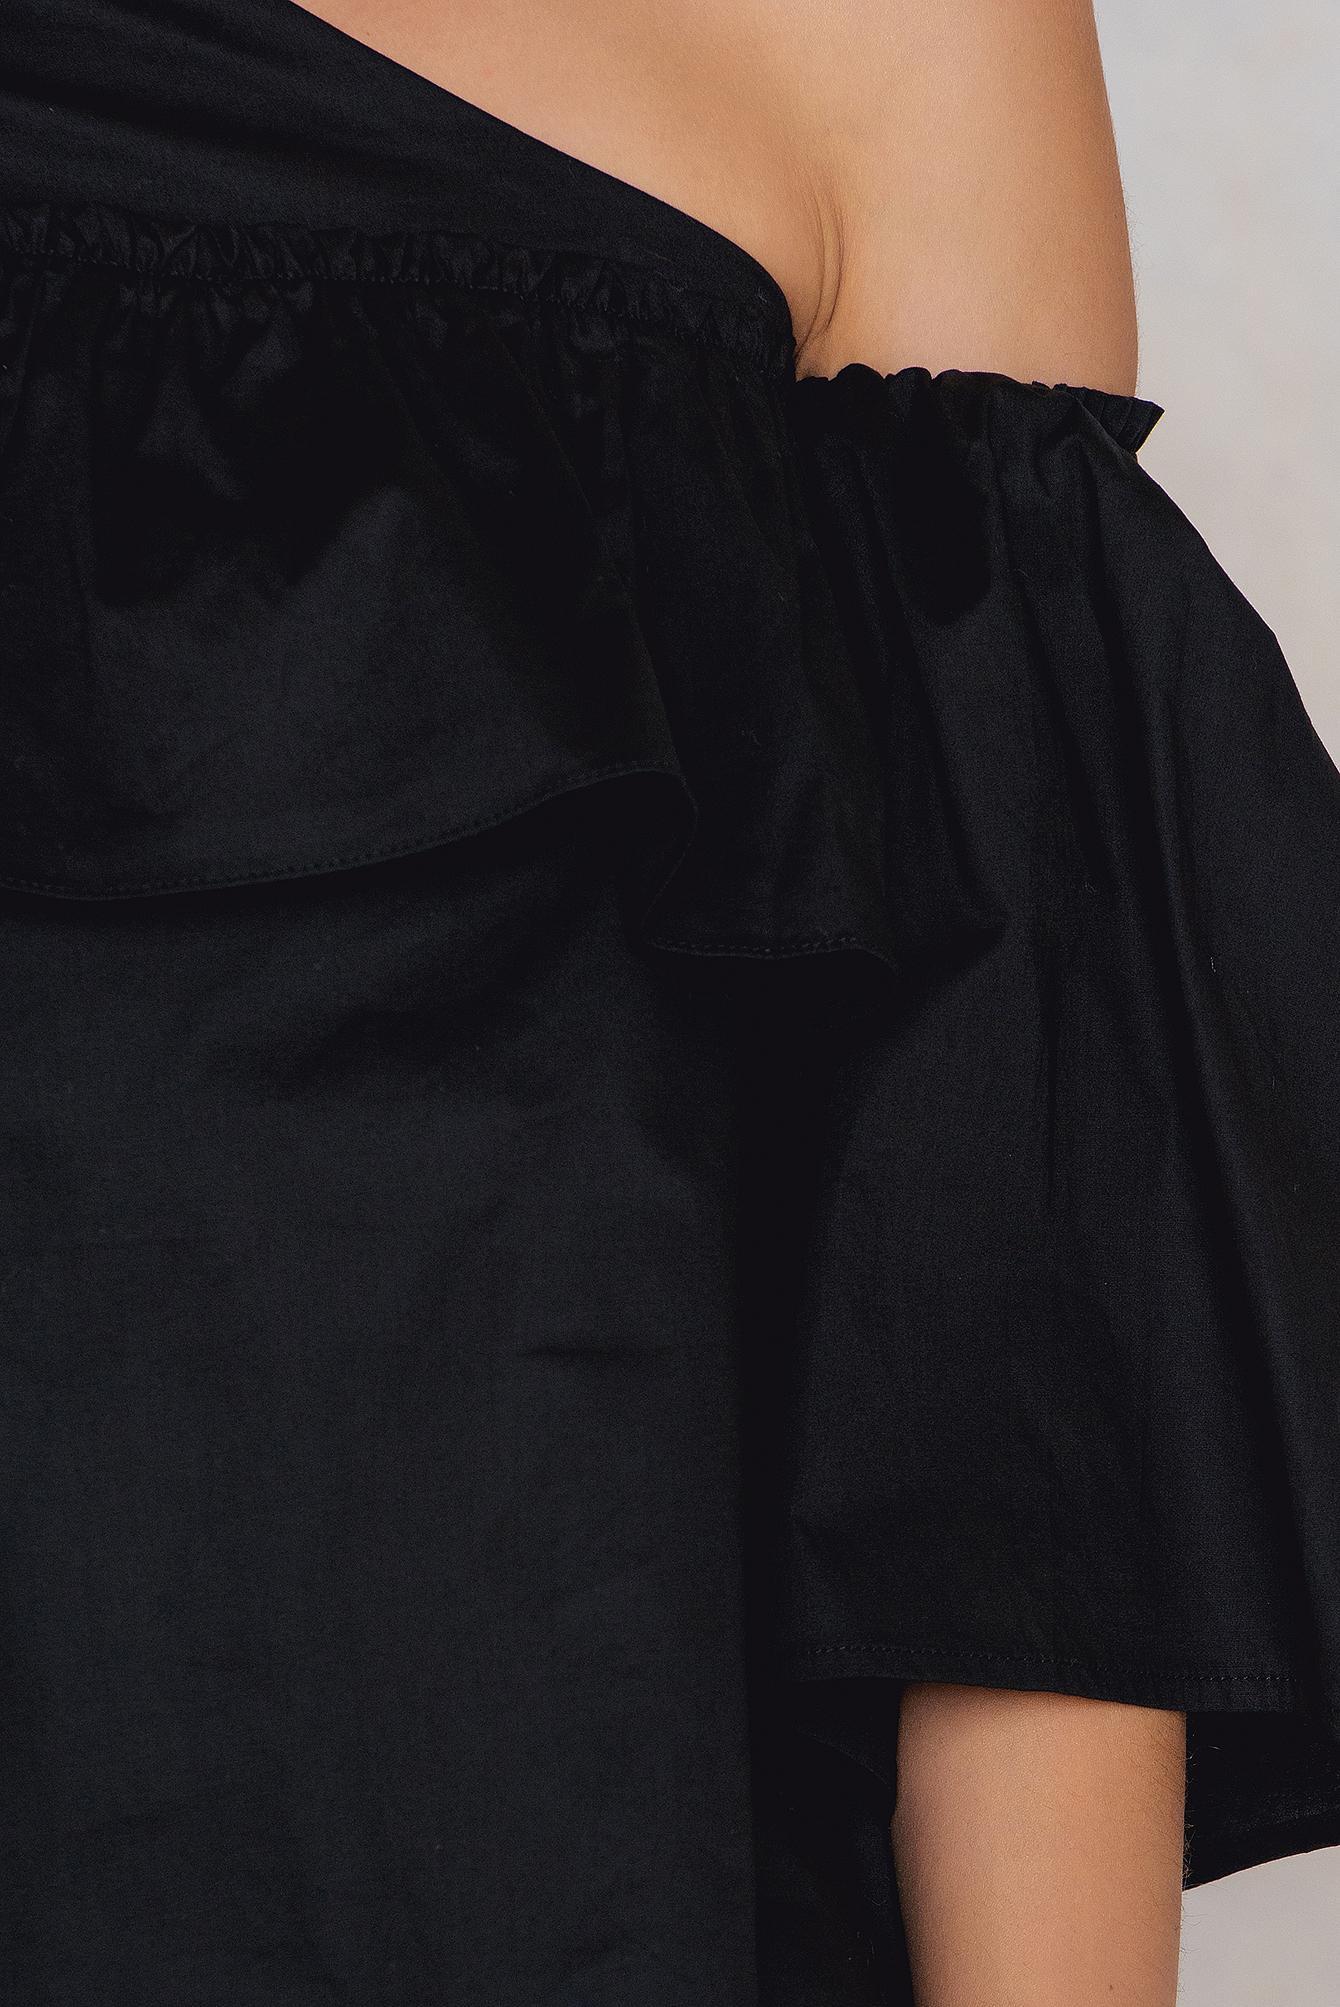 ecbe4376ae4eda Lucca Couture - Black Adeline One Shoulder Ruffle Top - Lyst. View  fullscreen